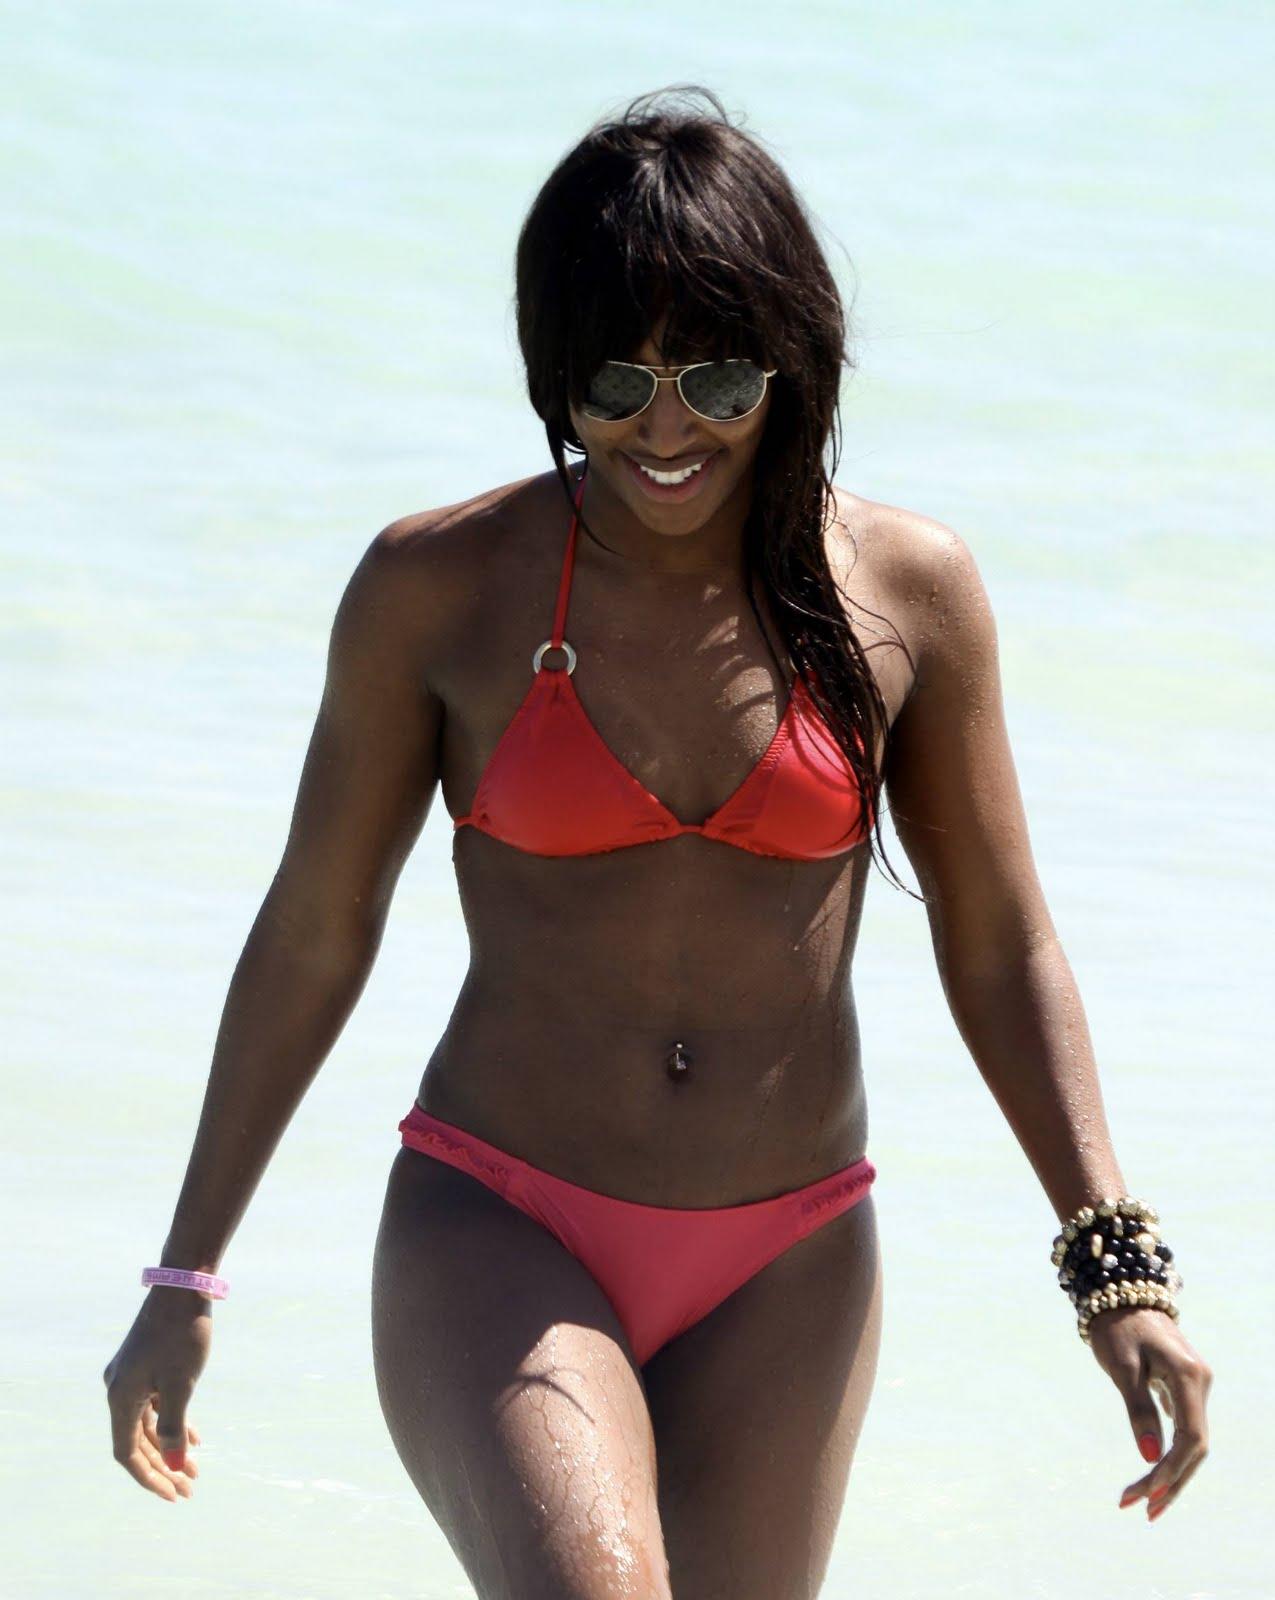 http://3.bp.blogspot.com/-lHNkUL2Avbo/TXiguSKHGbI/AAAAAAAAG0s/TavZDk4G9PU/s1600/celebskin_alexandra_burke_bikini_cleavage_ass_candids_3.jpg